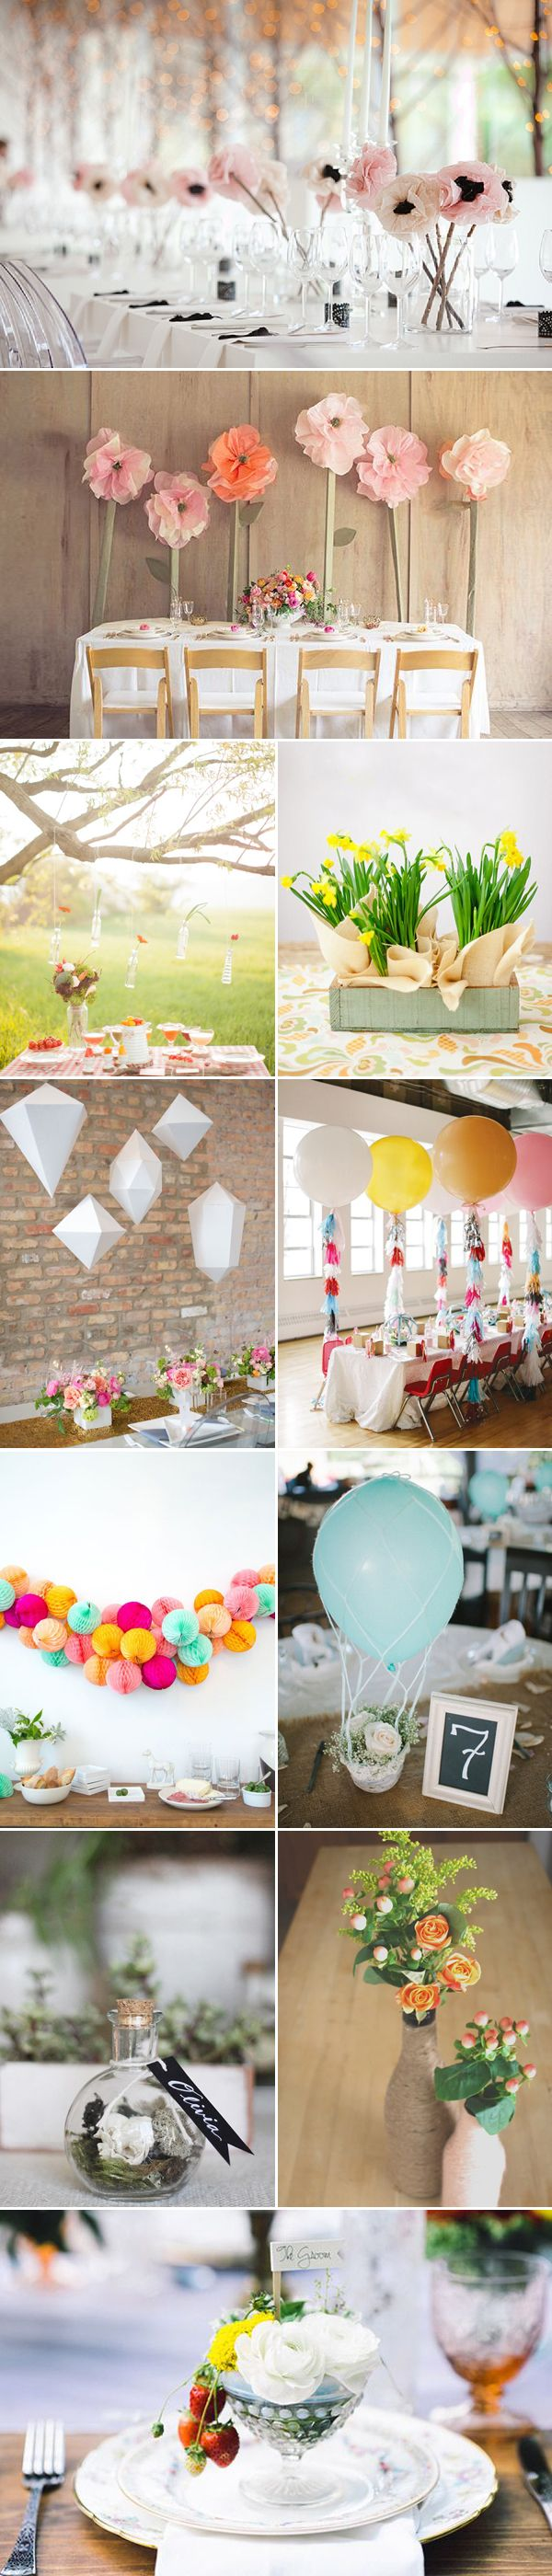 48 Creative Handmade Wedding Details - Tablescape